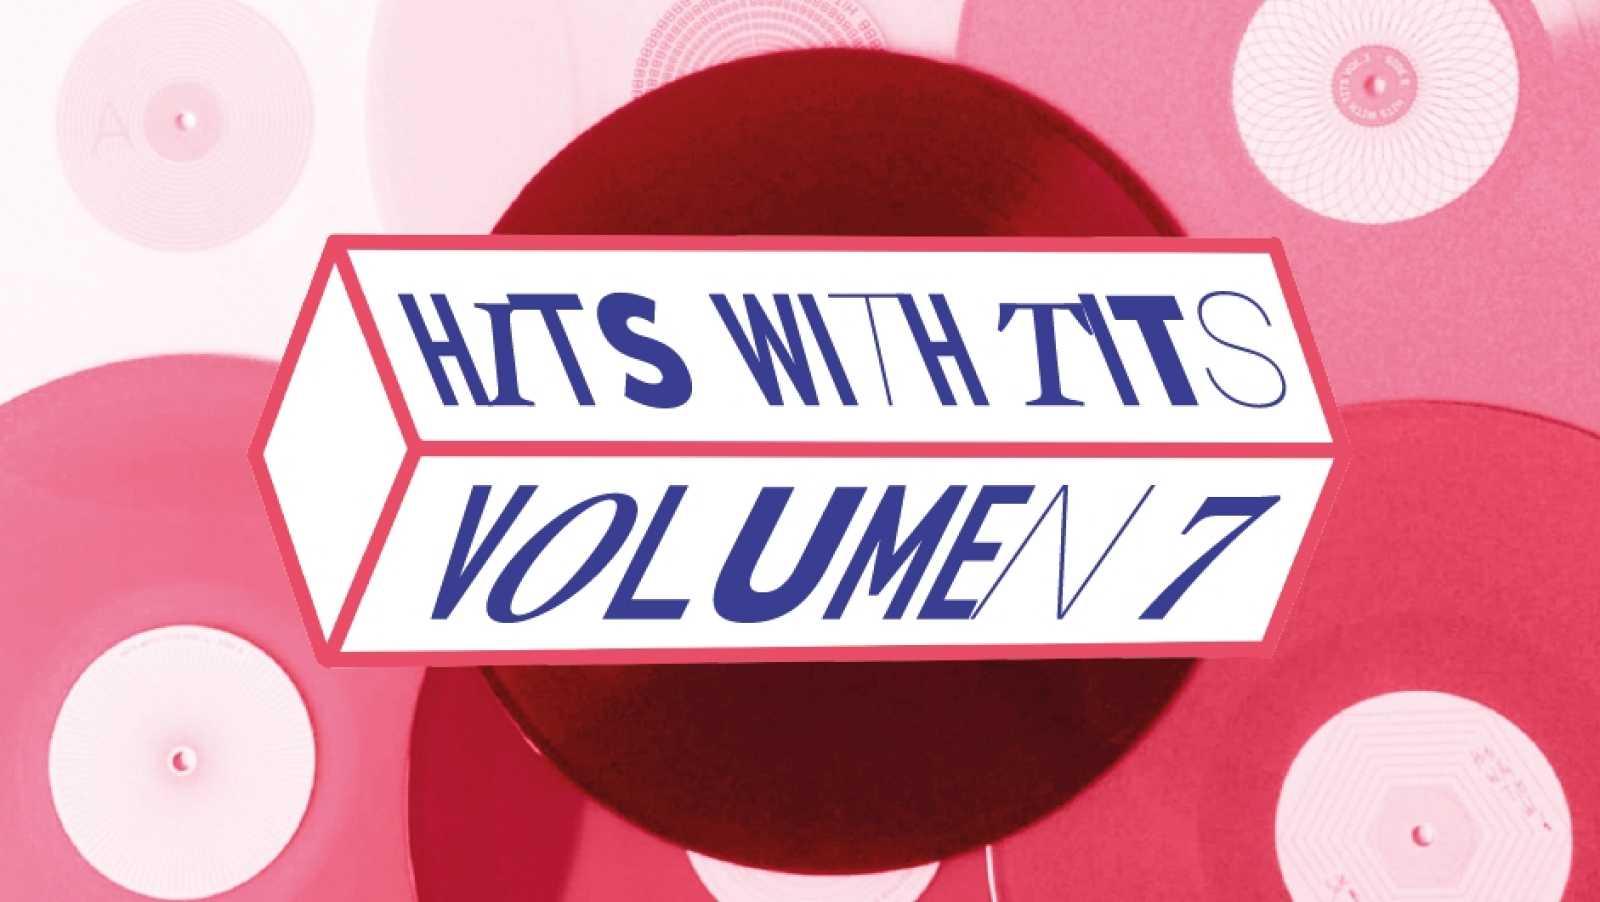 Capitán Demo - Hits With Tits vol7 - 23/11/20 - escuchar ahora